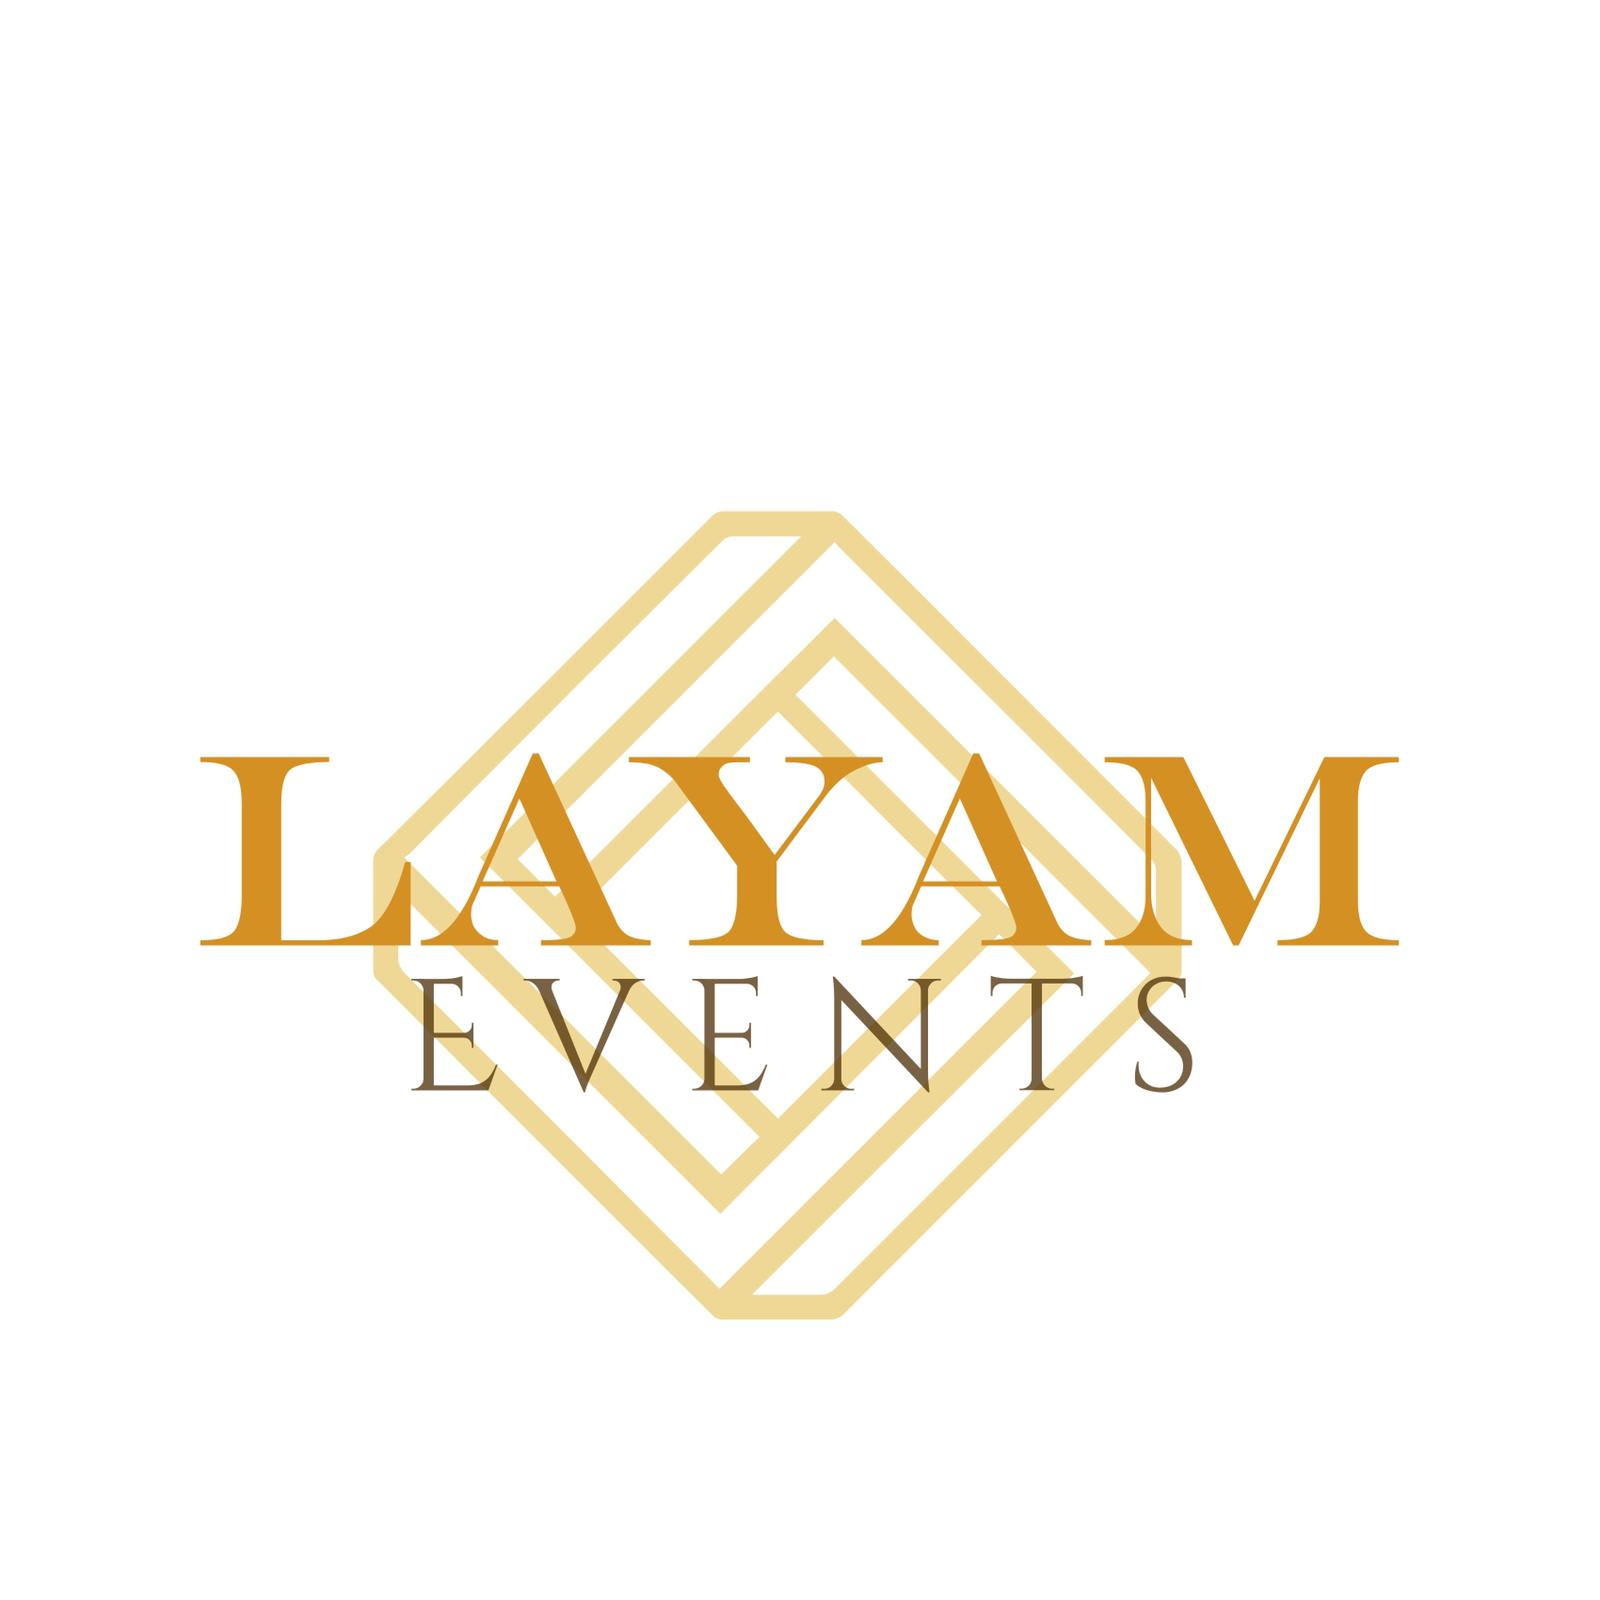 Layam Events